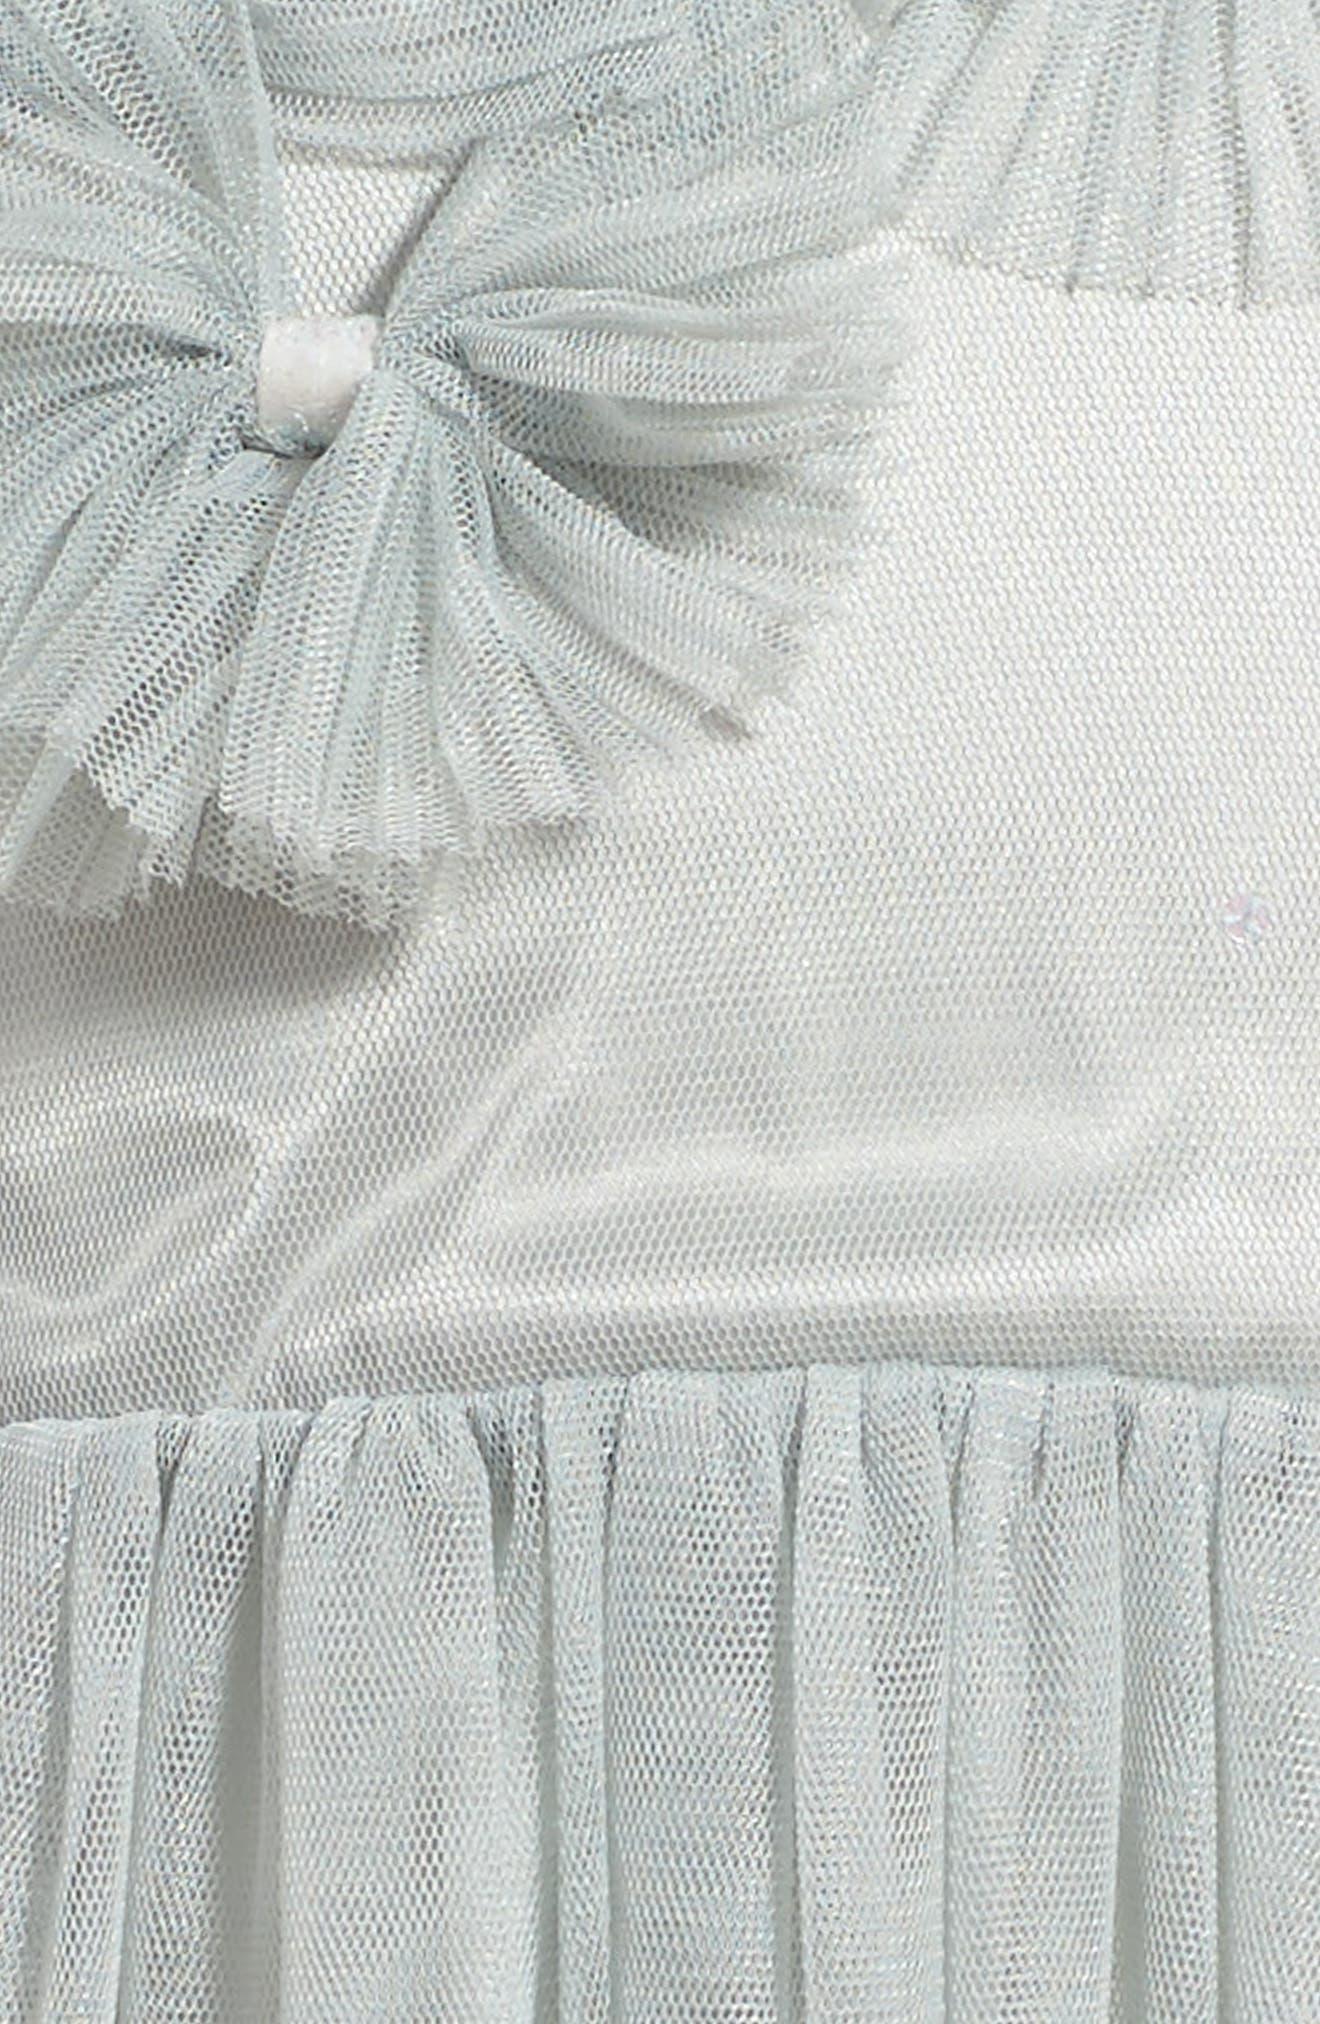 Alternate Image 3  - Popatu Sleeveless Tulle Dress (Toddler Girls, Little Girls & Big Girls)